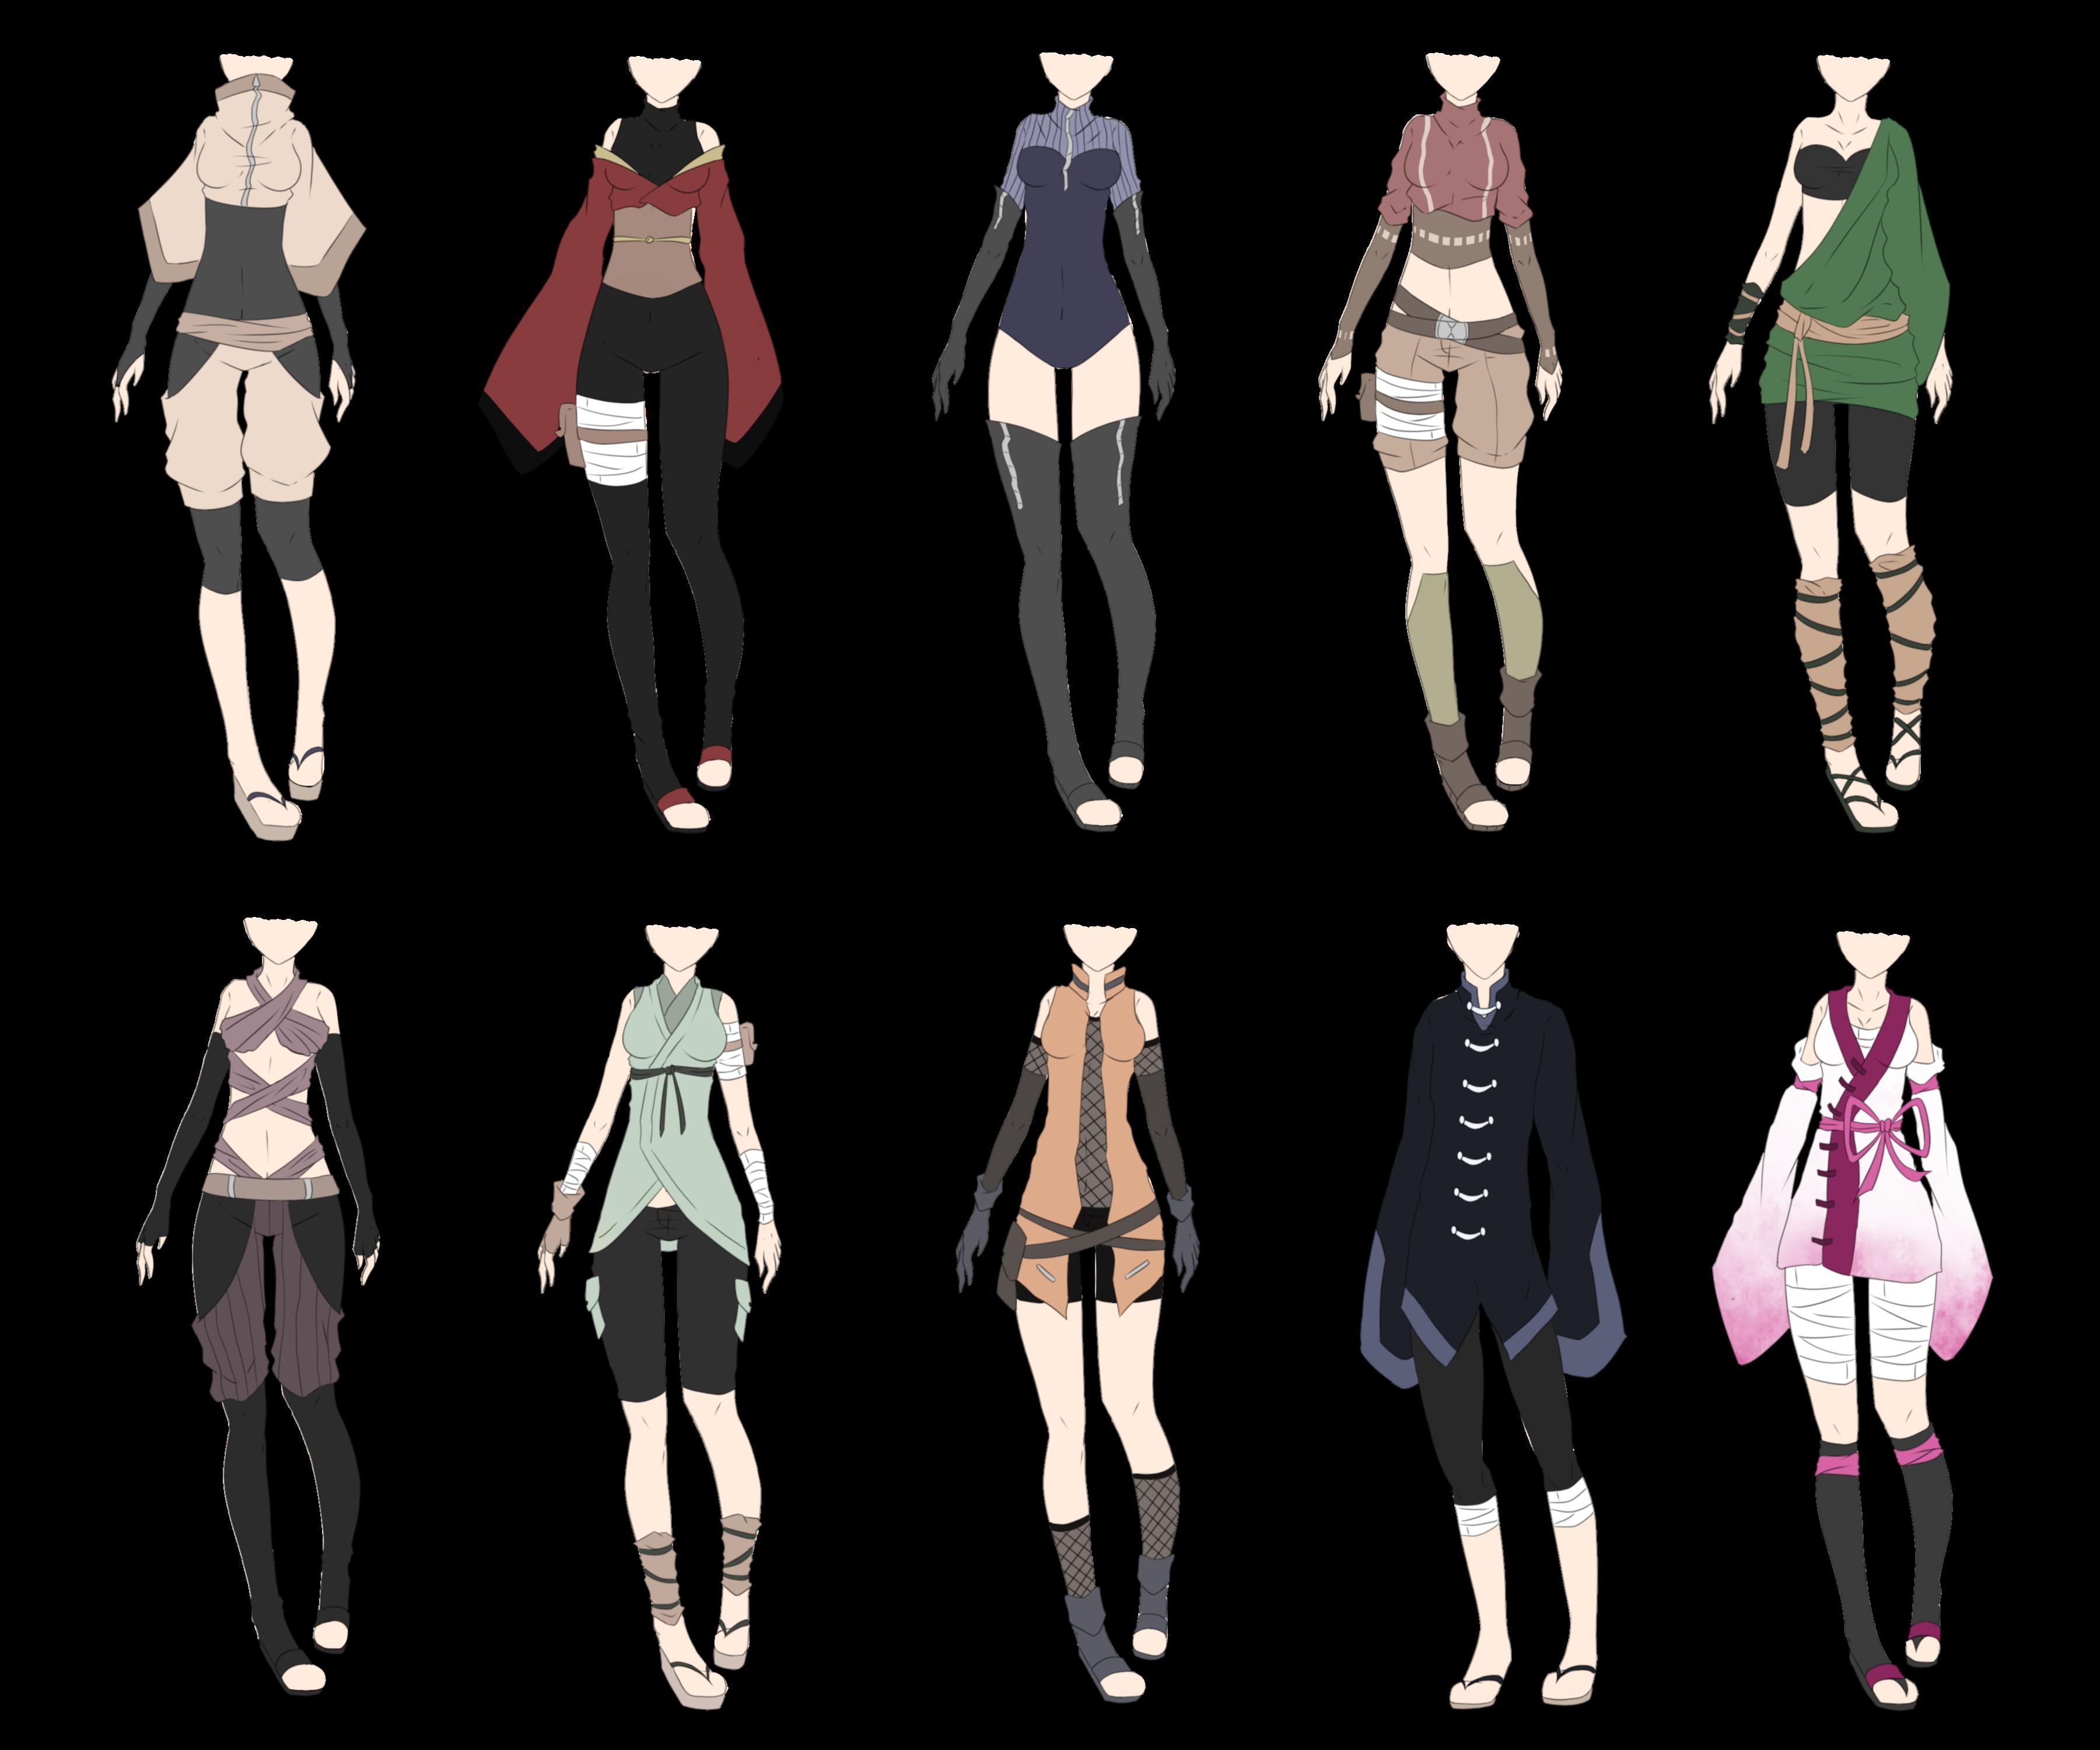 Ninja Outfits Fantasy clothing, Ninja outfit, Anime outfits